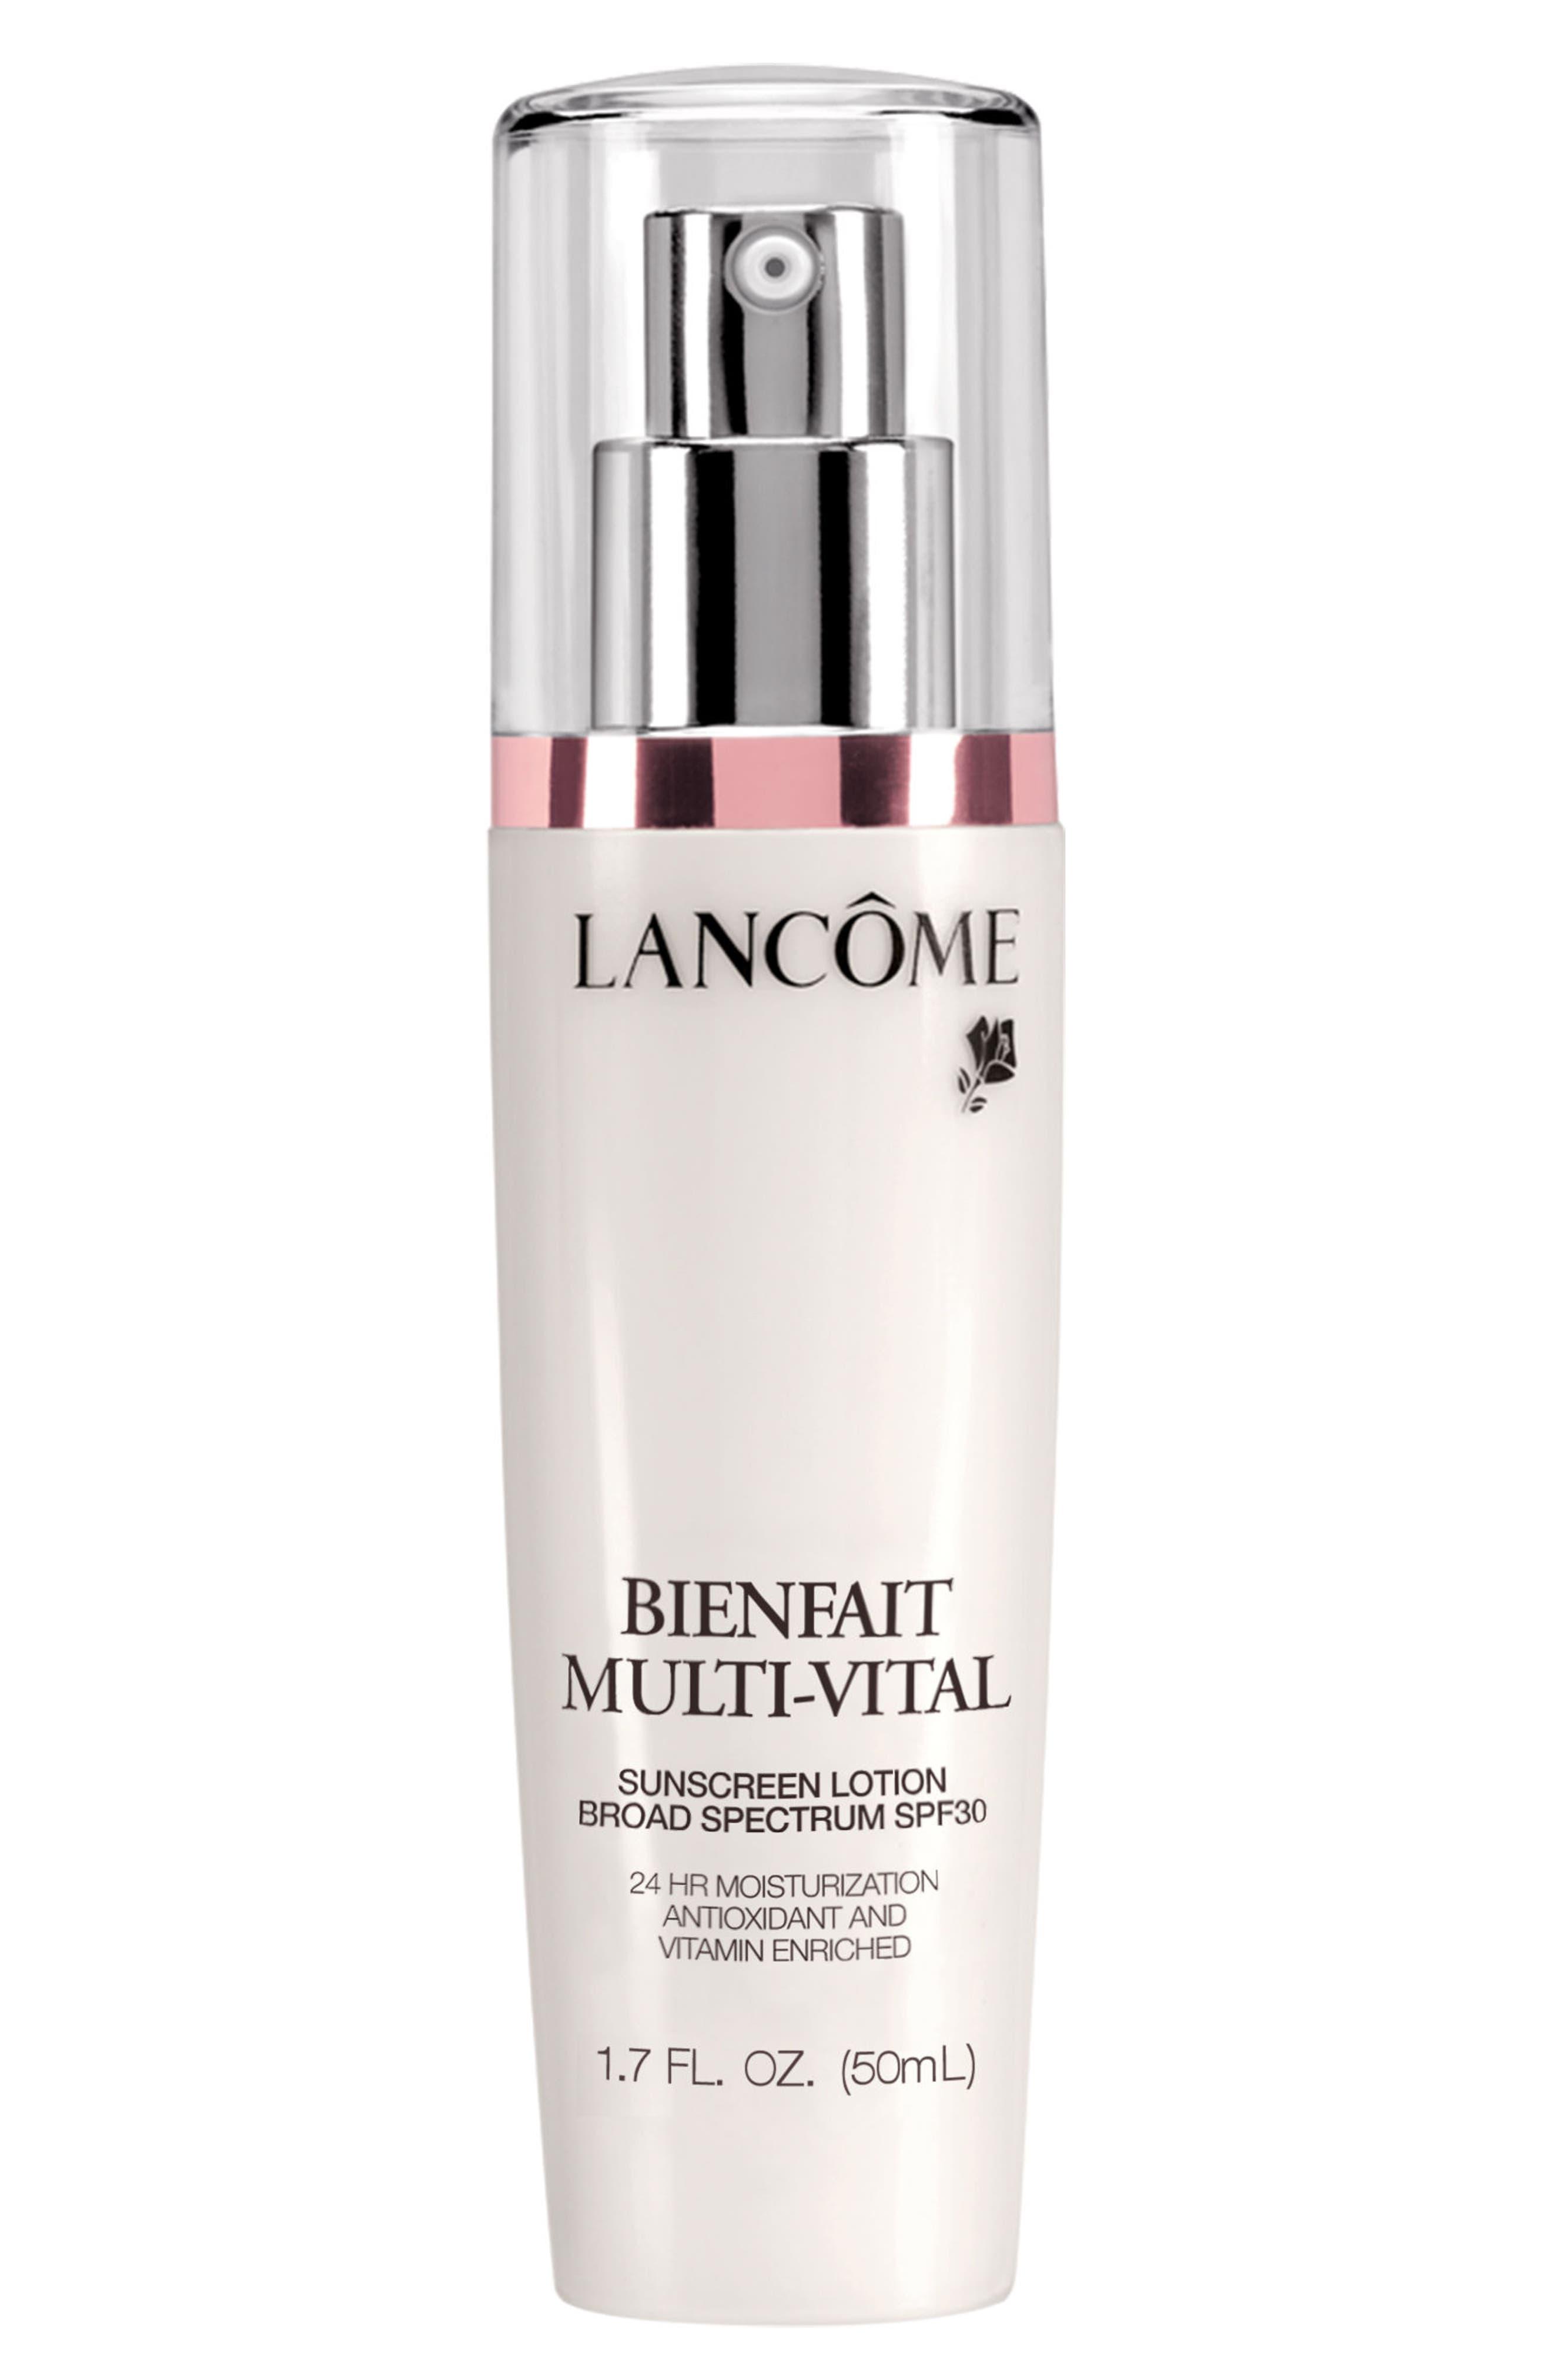 Lancôme 'Bienfait Multi-Vital' SPF 30 Sunscreen